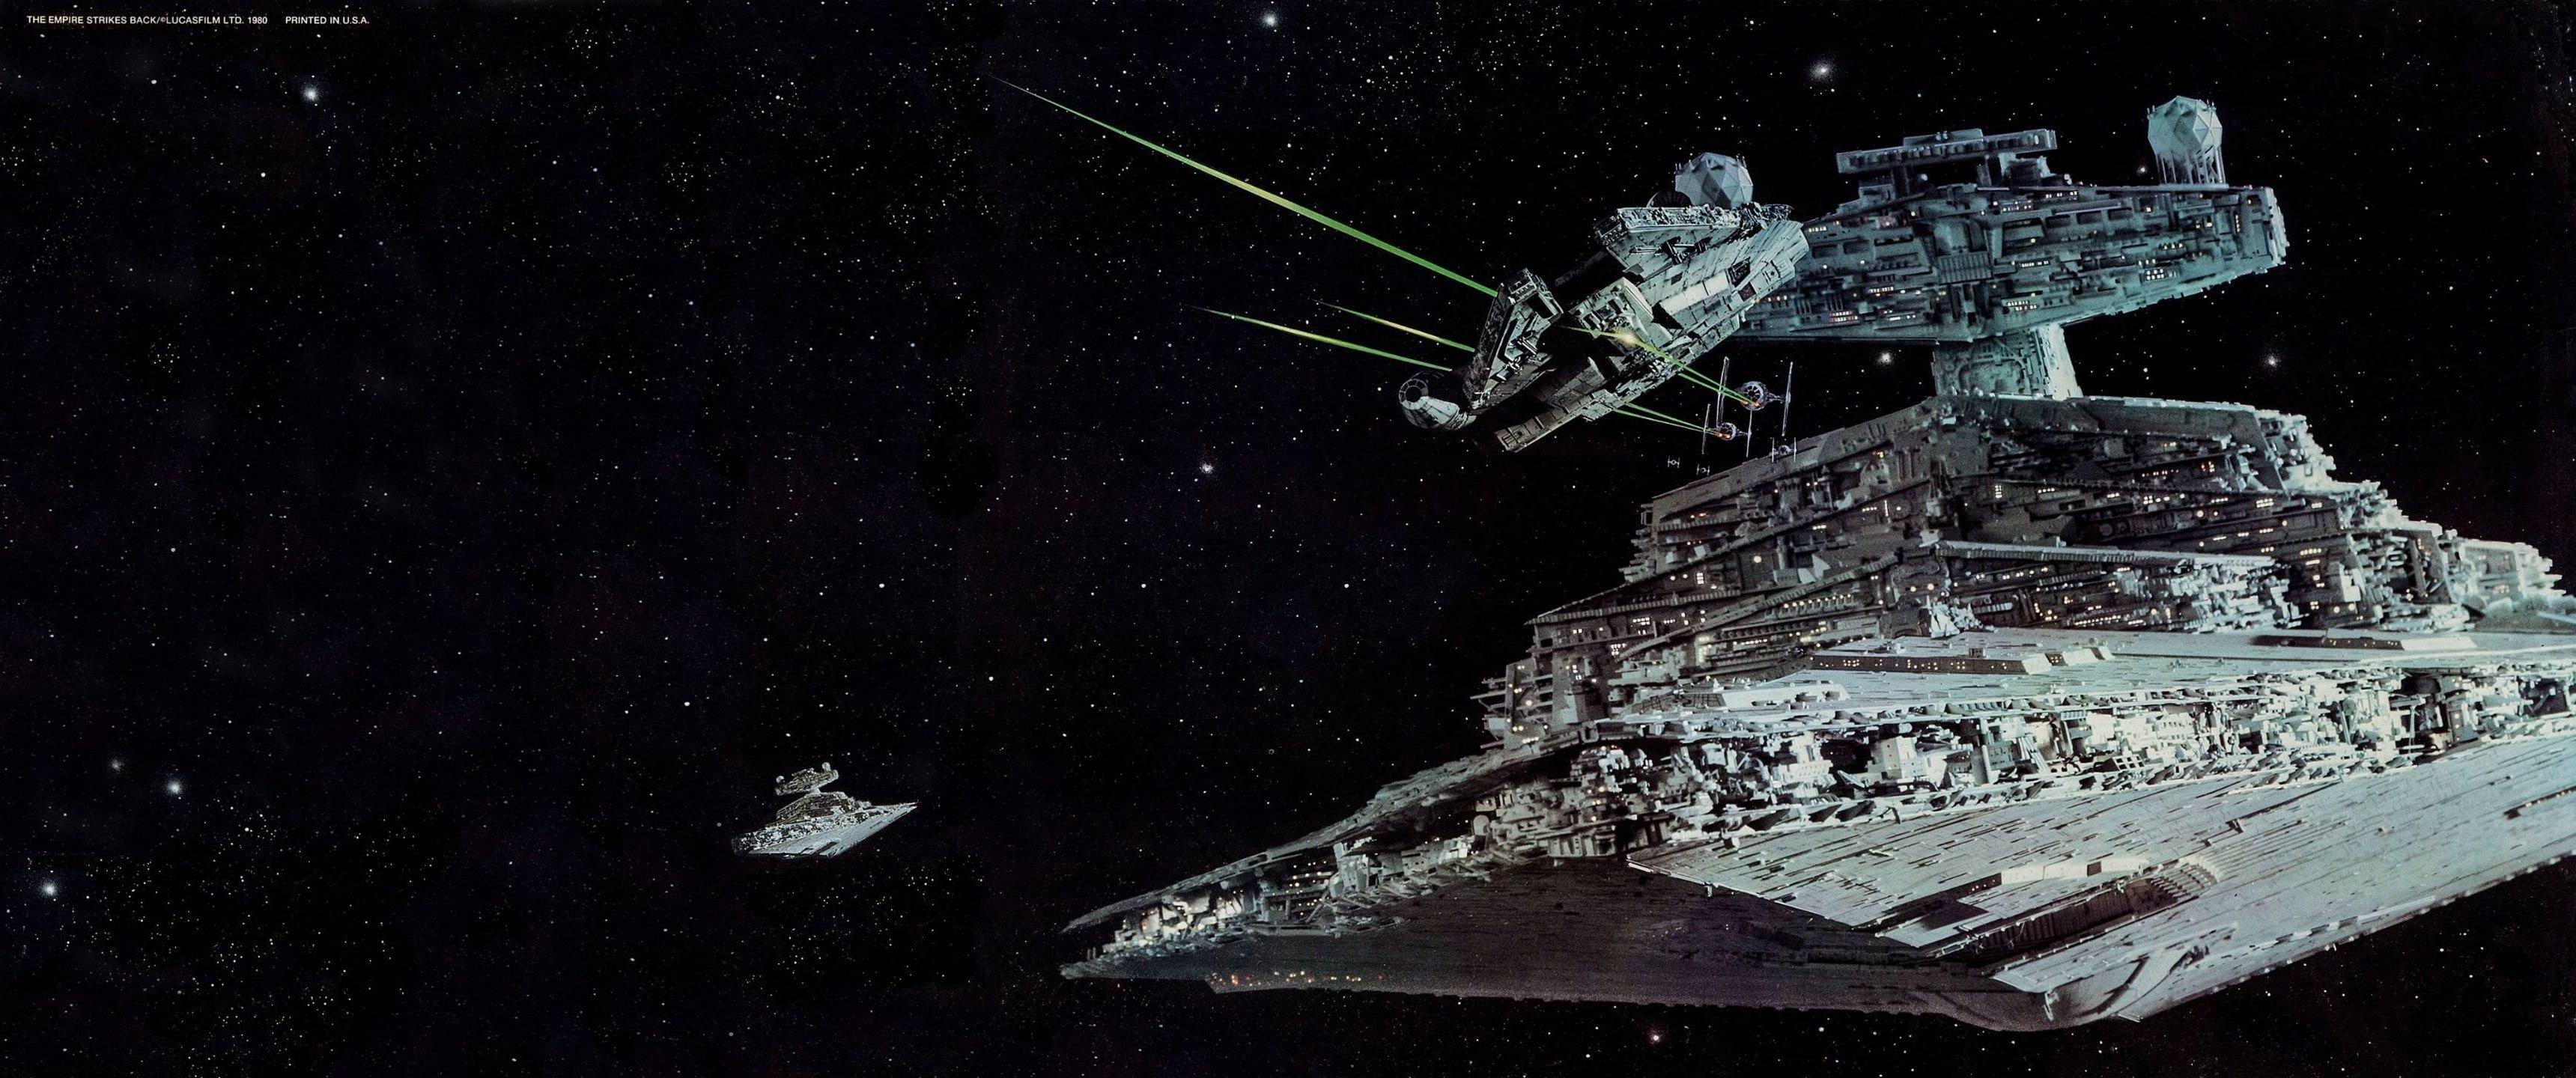 Wallpaper Star Wars Millennium Falcon Star Destroyer 3440x1440 Lumia 1332641 Hd Wallpapers Wallhere